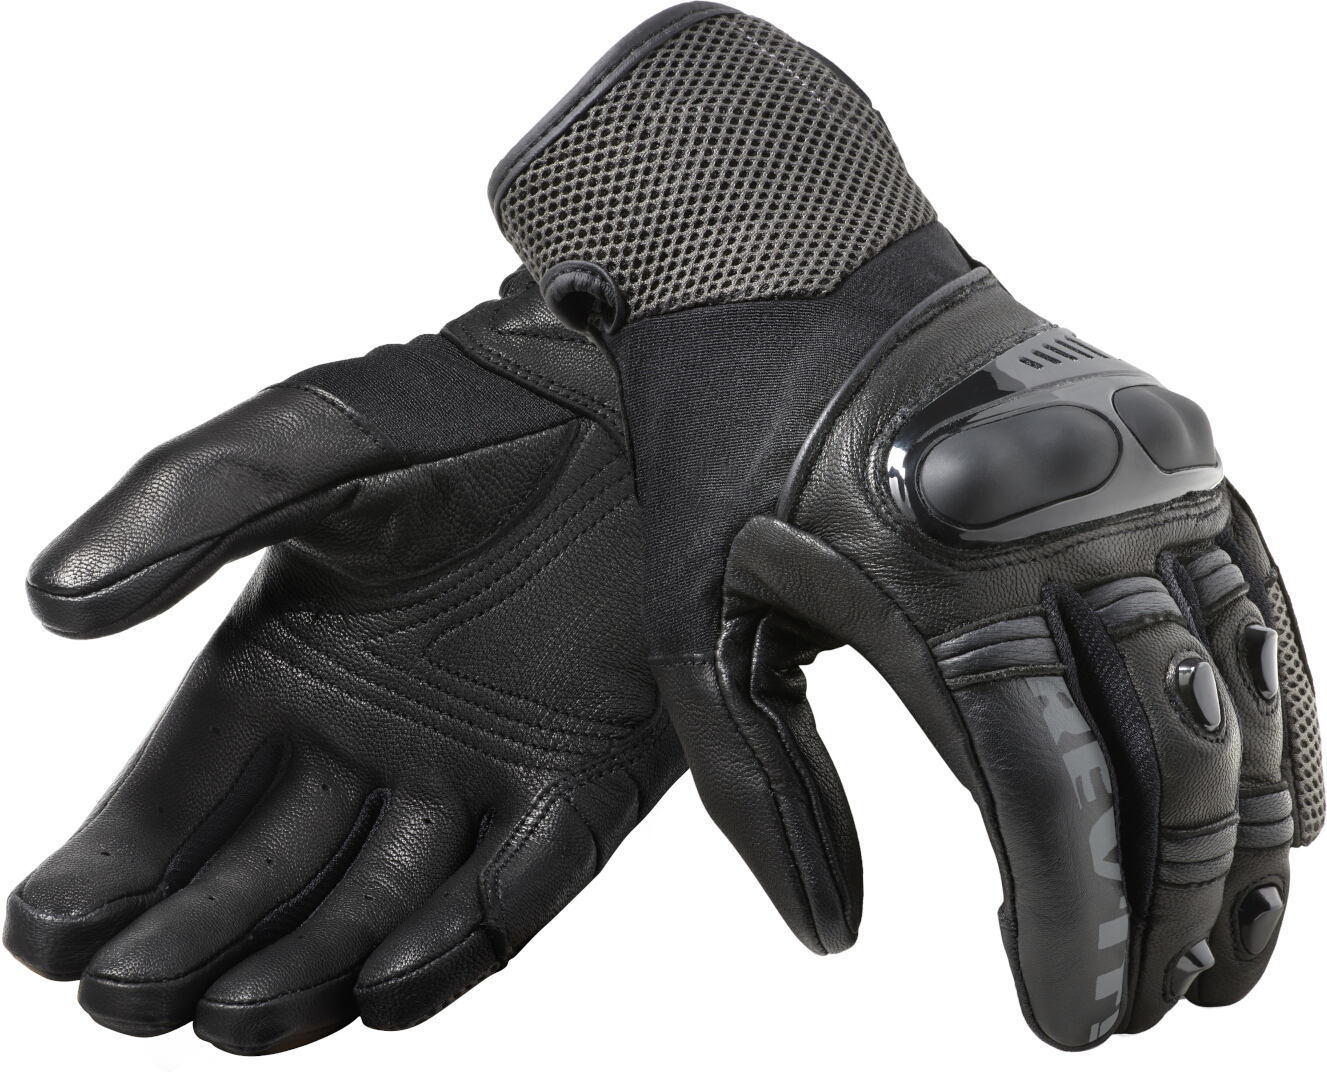 Revit Metric Motorradhandschuhe, schwarz-grau, Größe 2XL, schwarz-grau, Größe 2XL